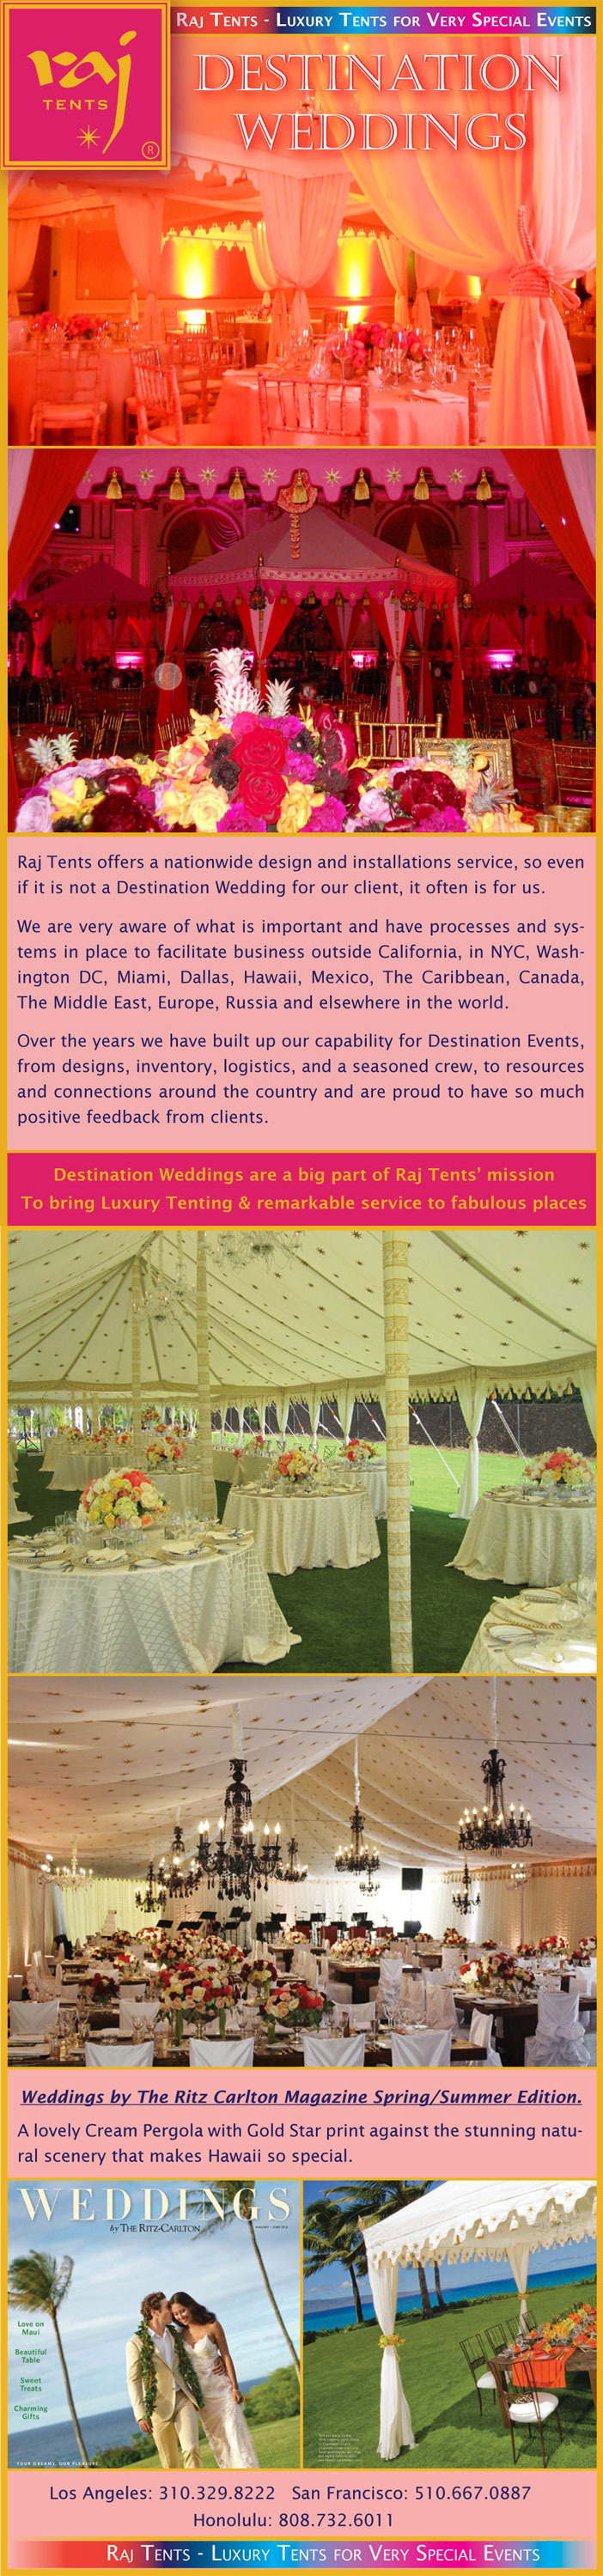 Raj Tents Destination Weddings